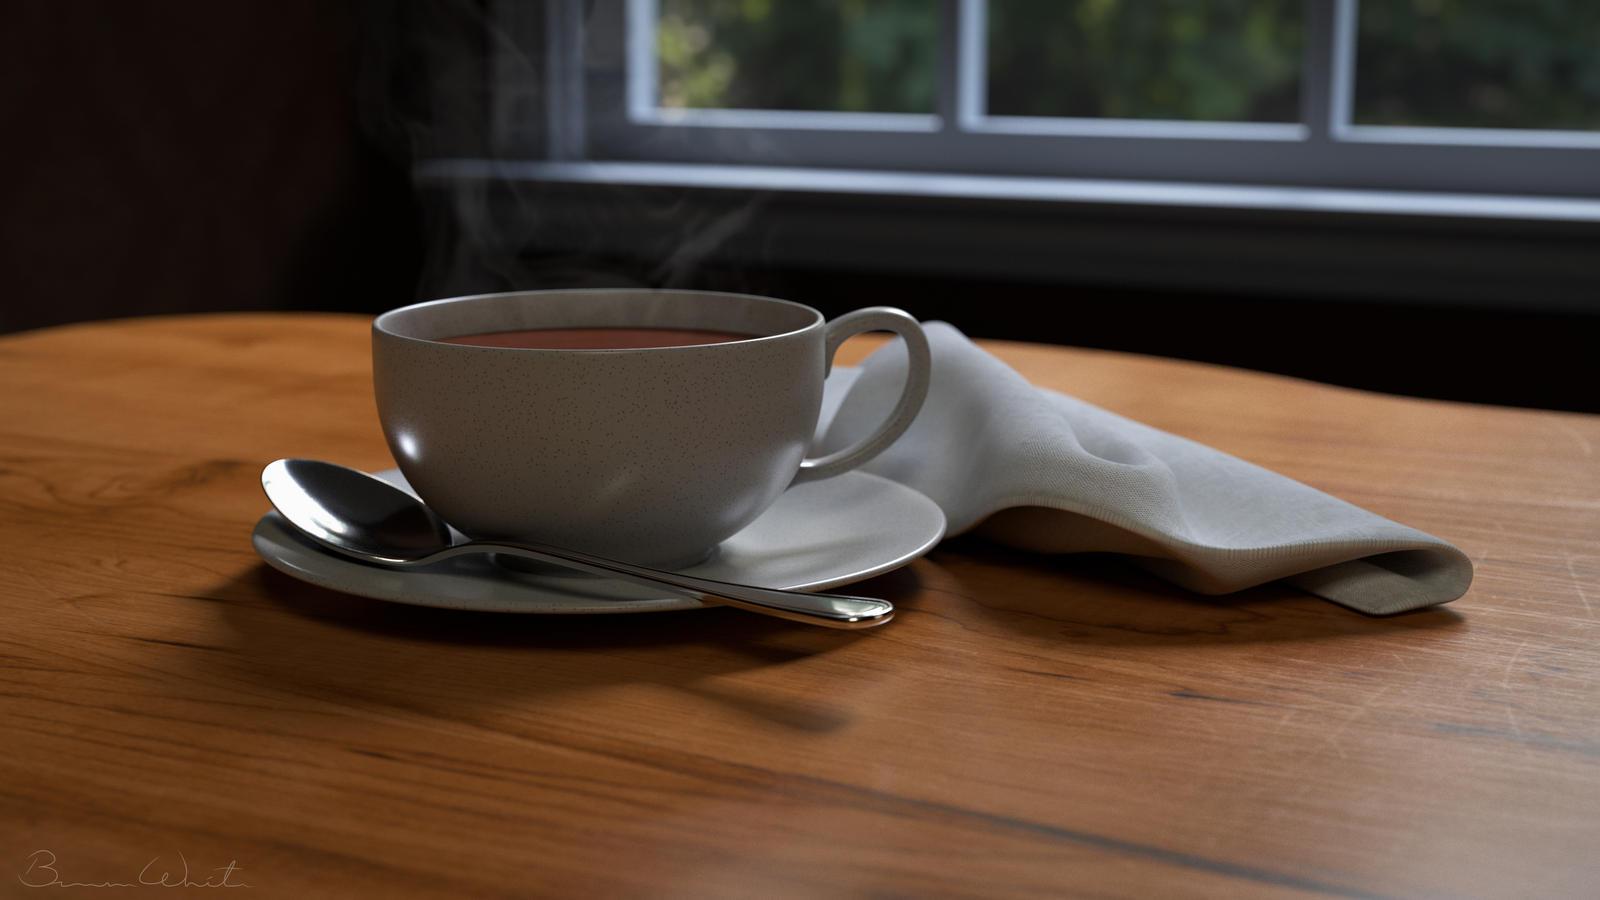 Teacup Still Life by polygonbronson